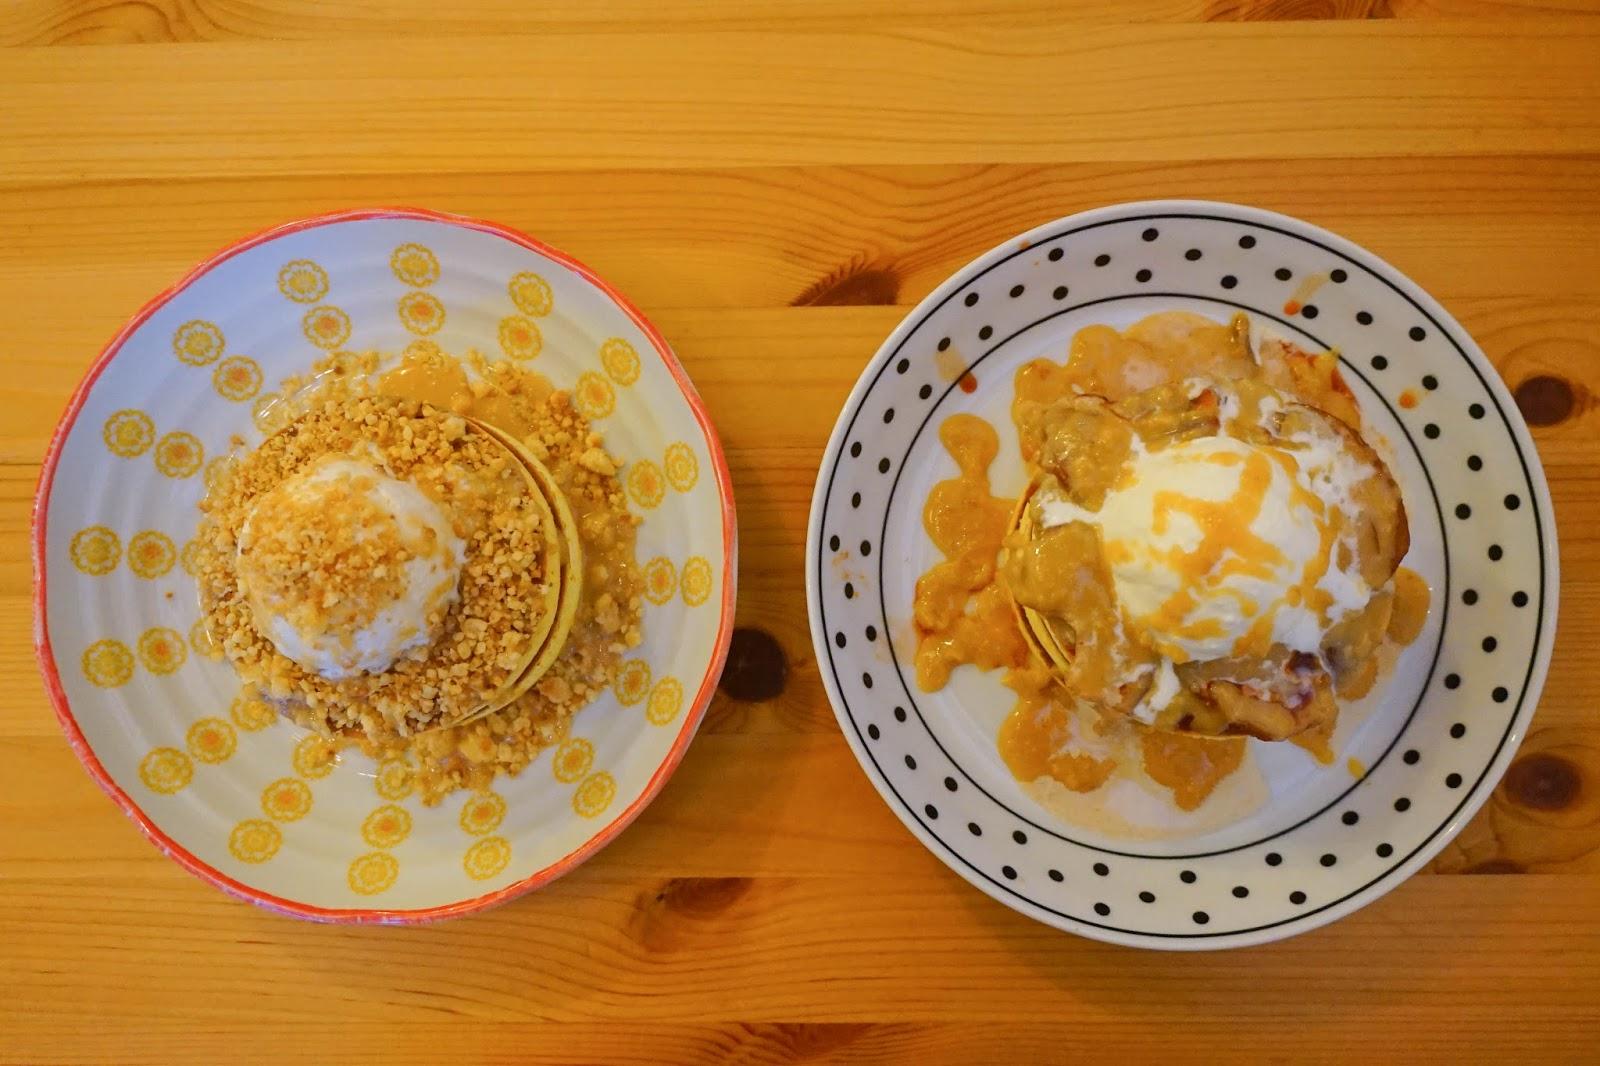 18-hualien-travel-woodstock-pancake-IMG_3696-beautyanxiety.com-hualien-desserts-woodstock-pancake